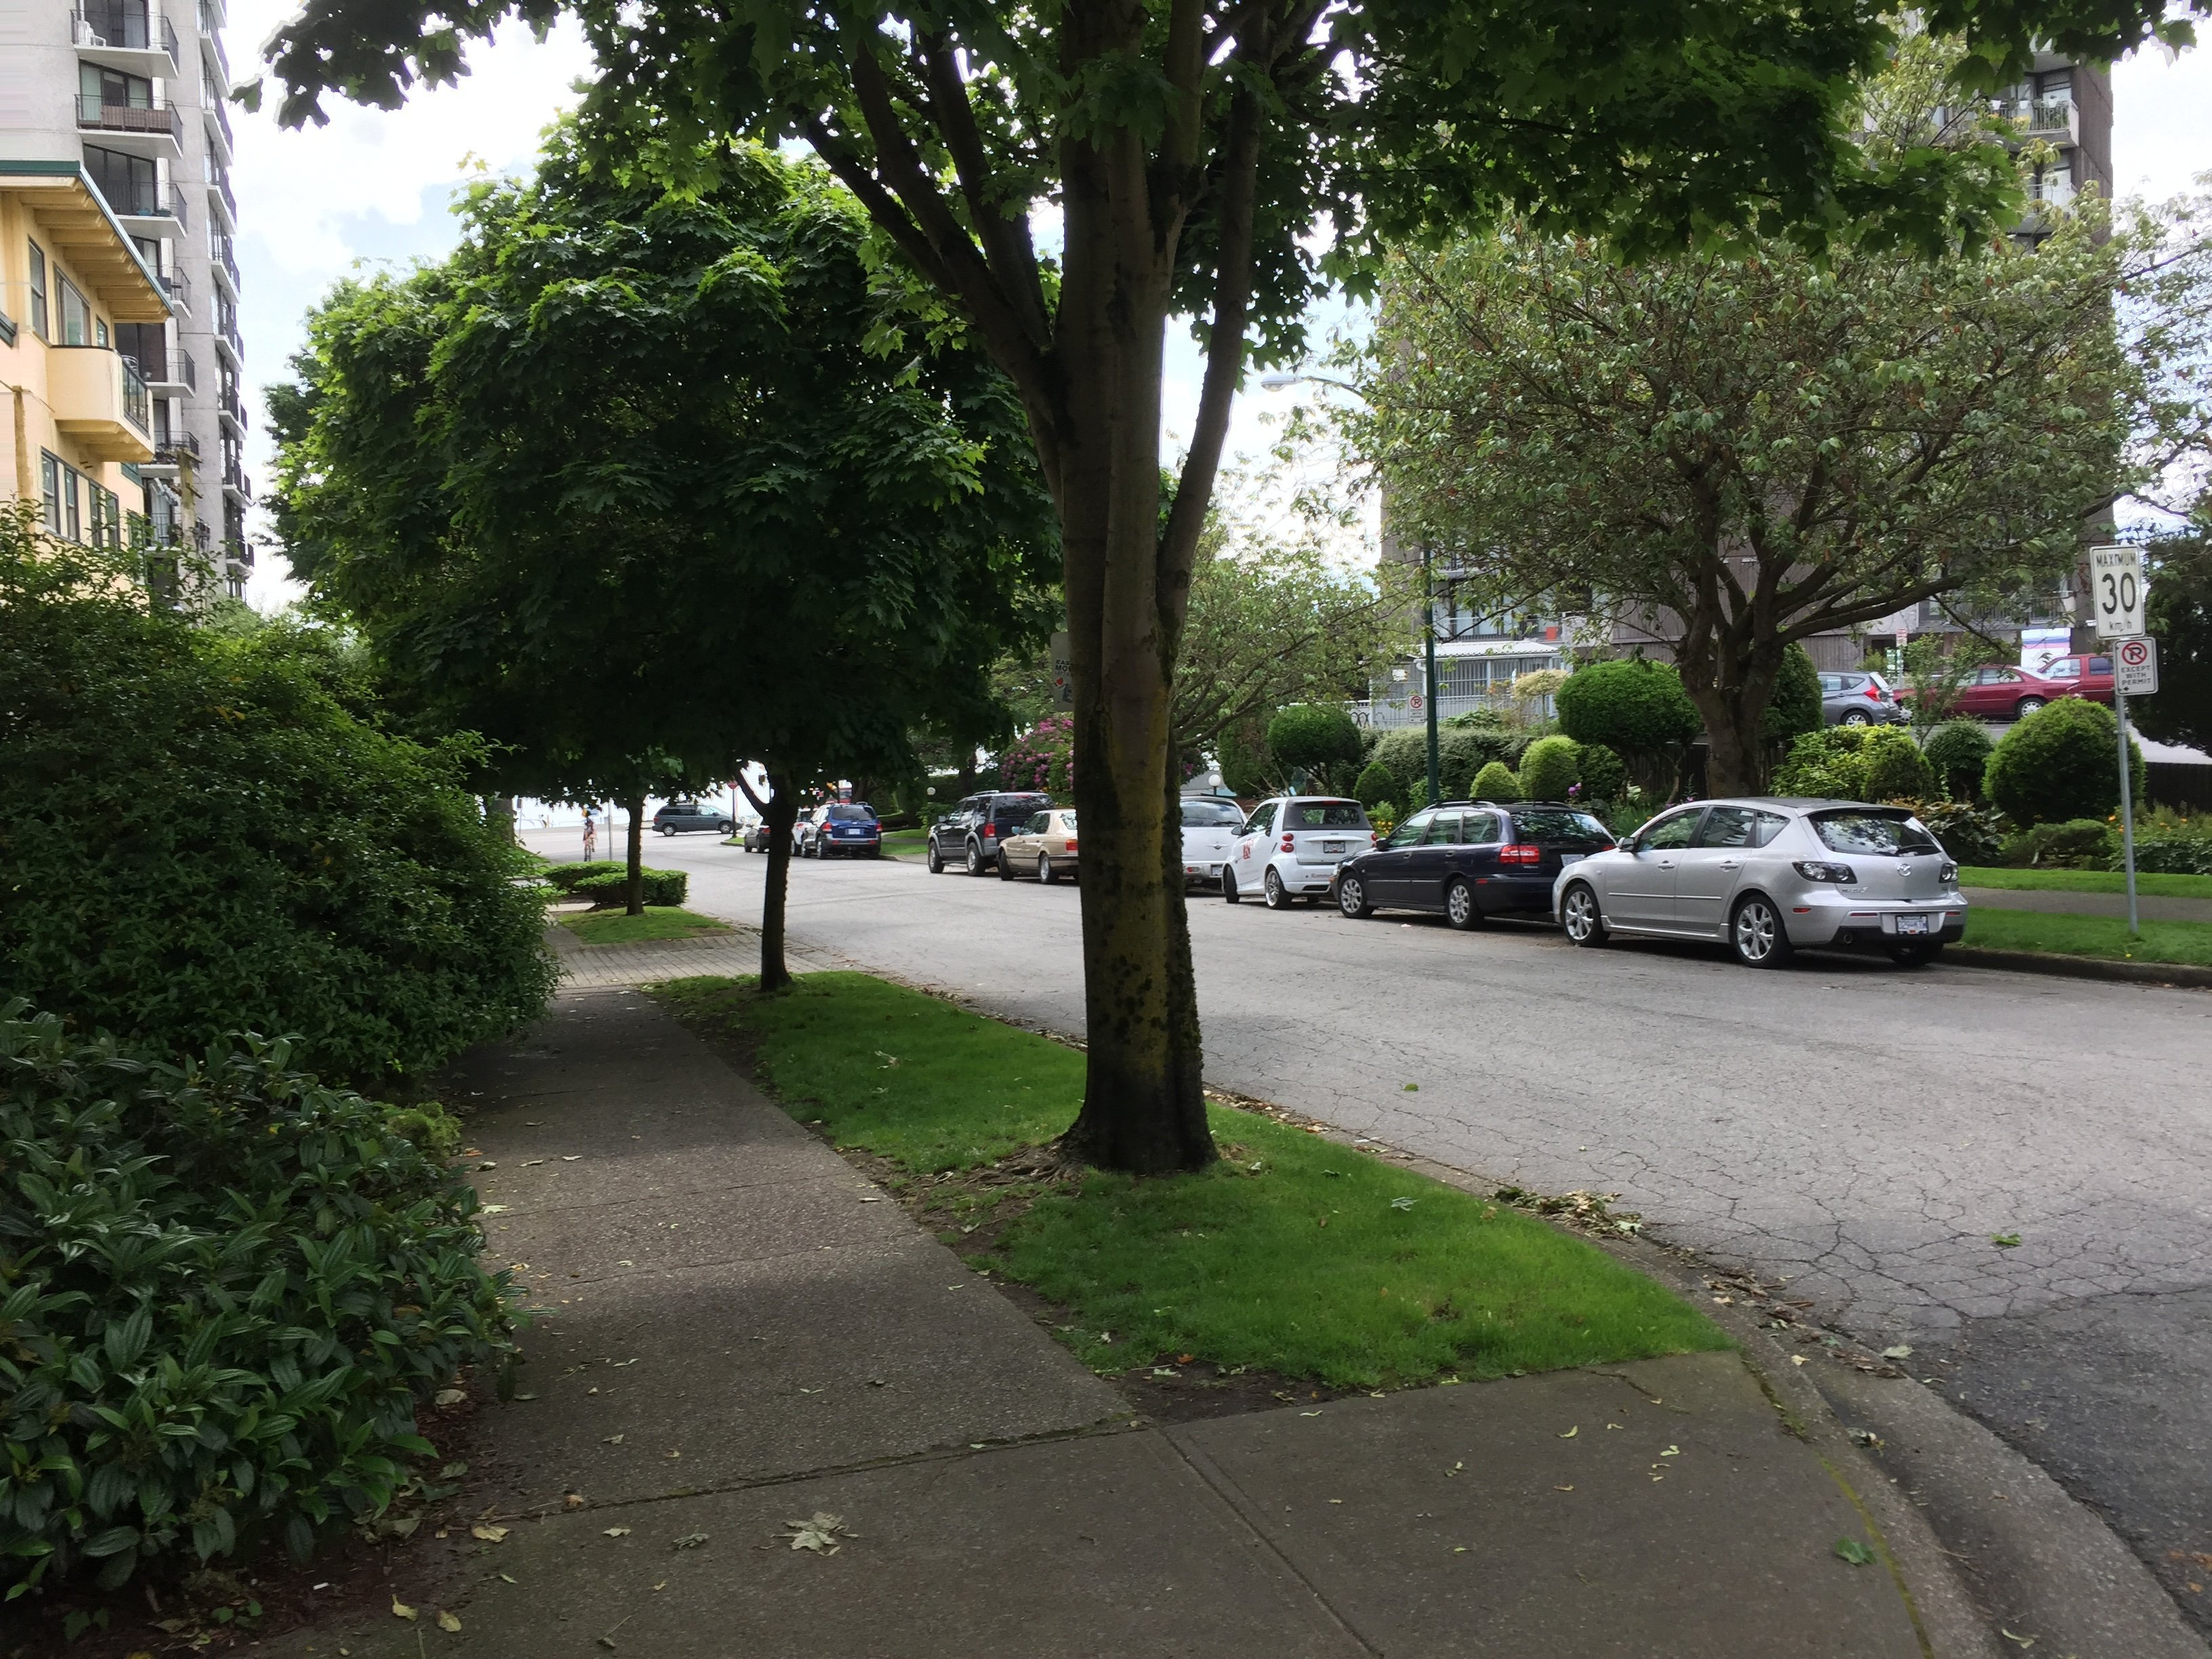 Harwood Street!